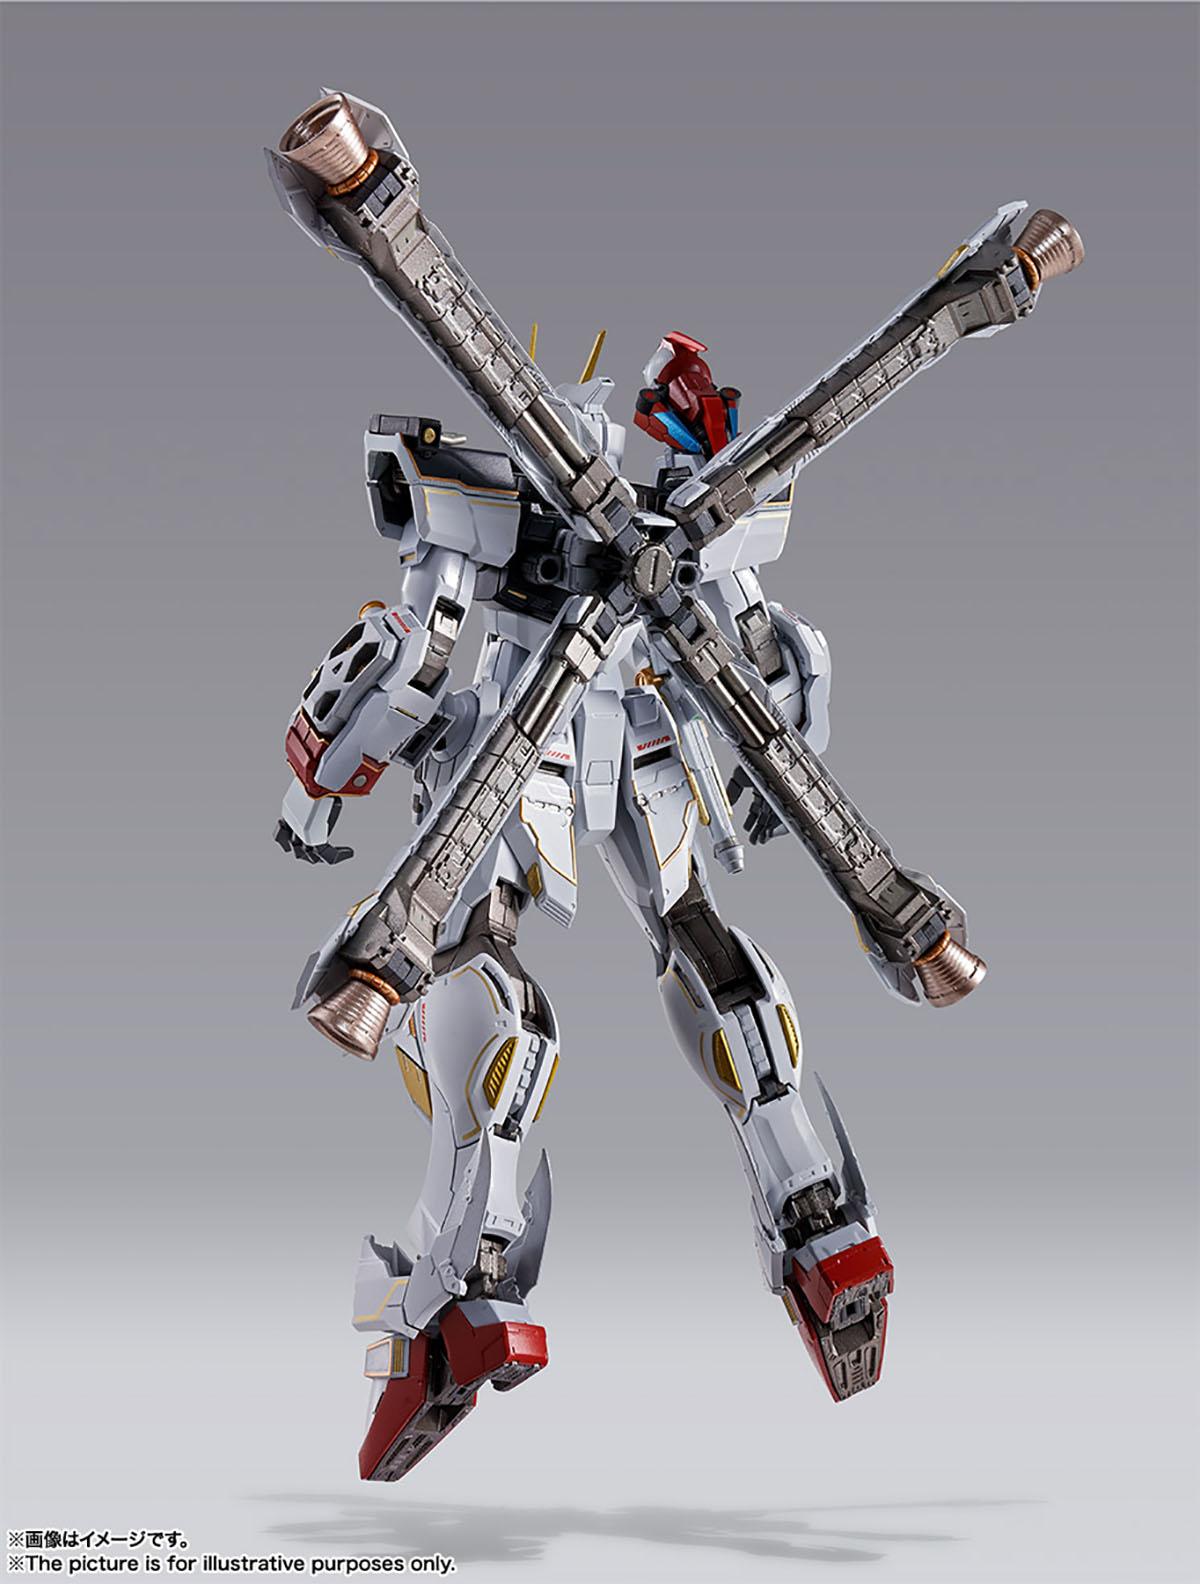 METAL BUILD『クロスボーン・ガンダムX1』機動戦士クロスボーン・ガンダム 可動フィギュア-012